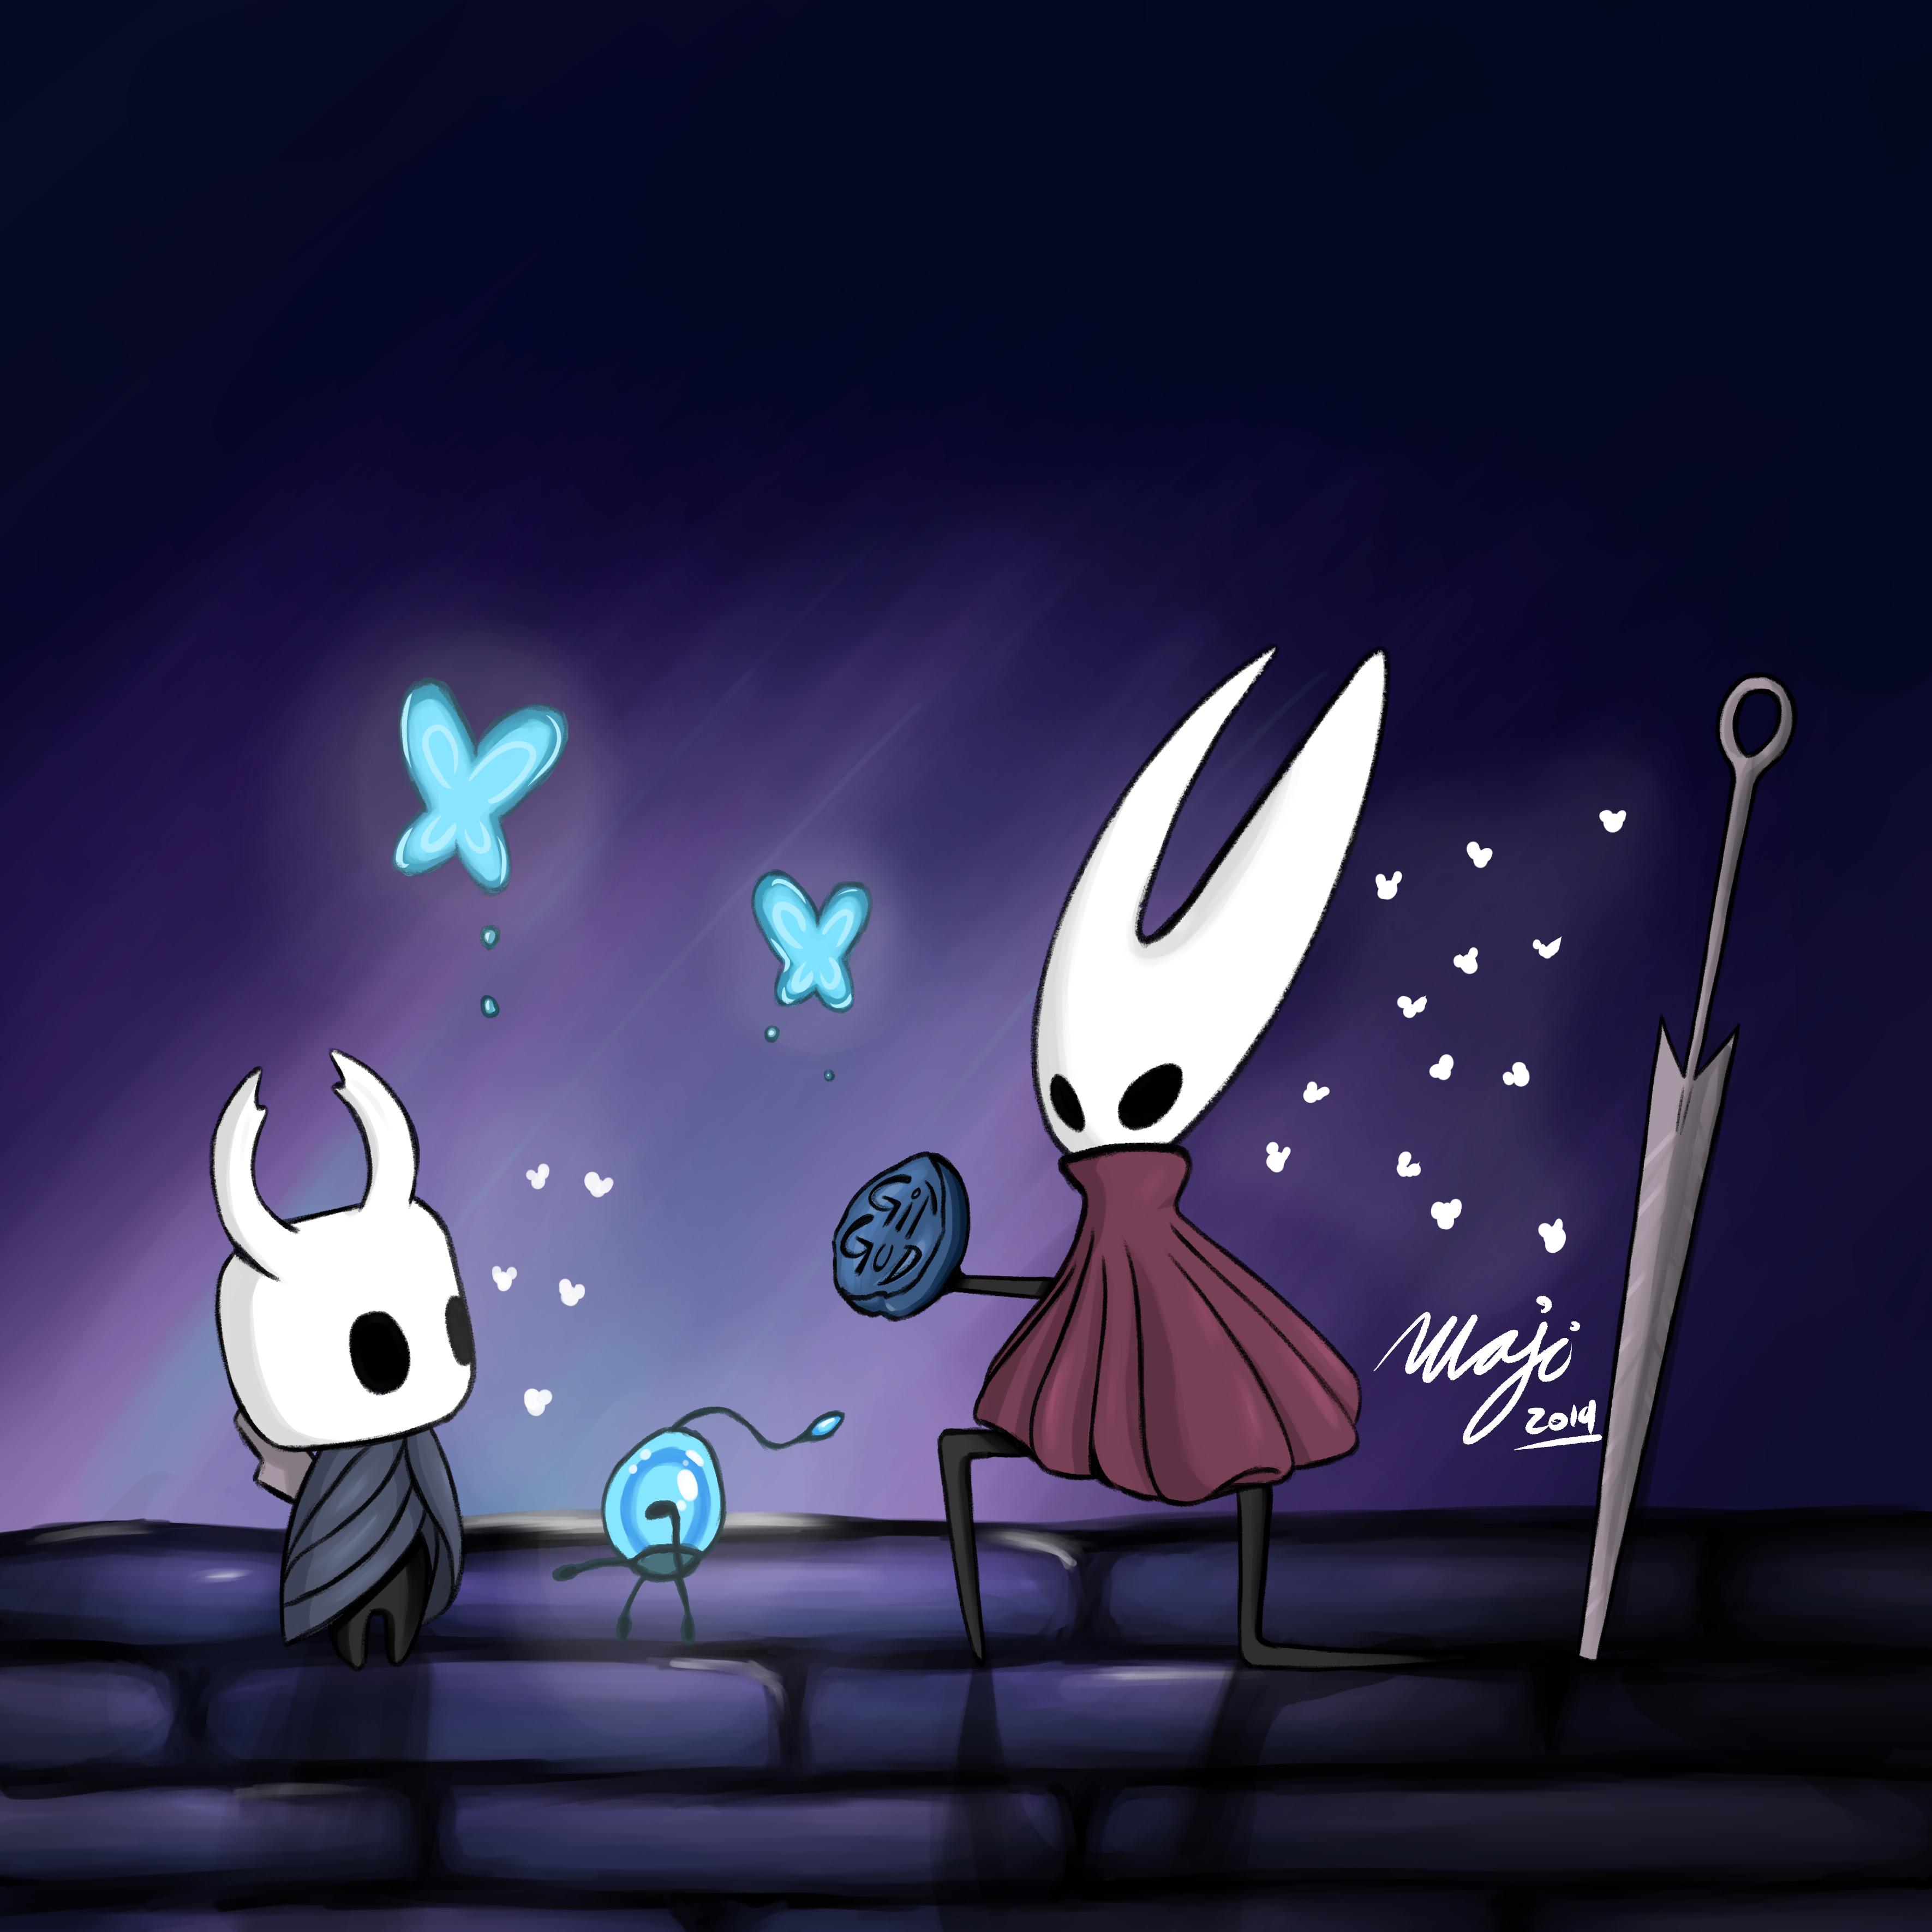 Hollow Knight Knight Hollow Night Git